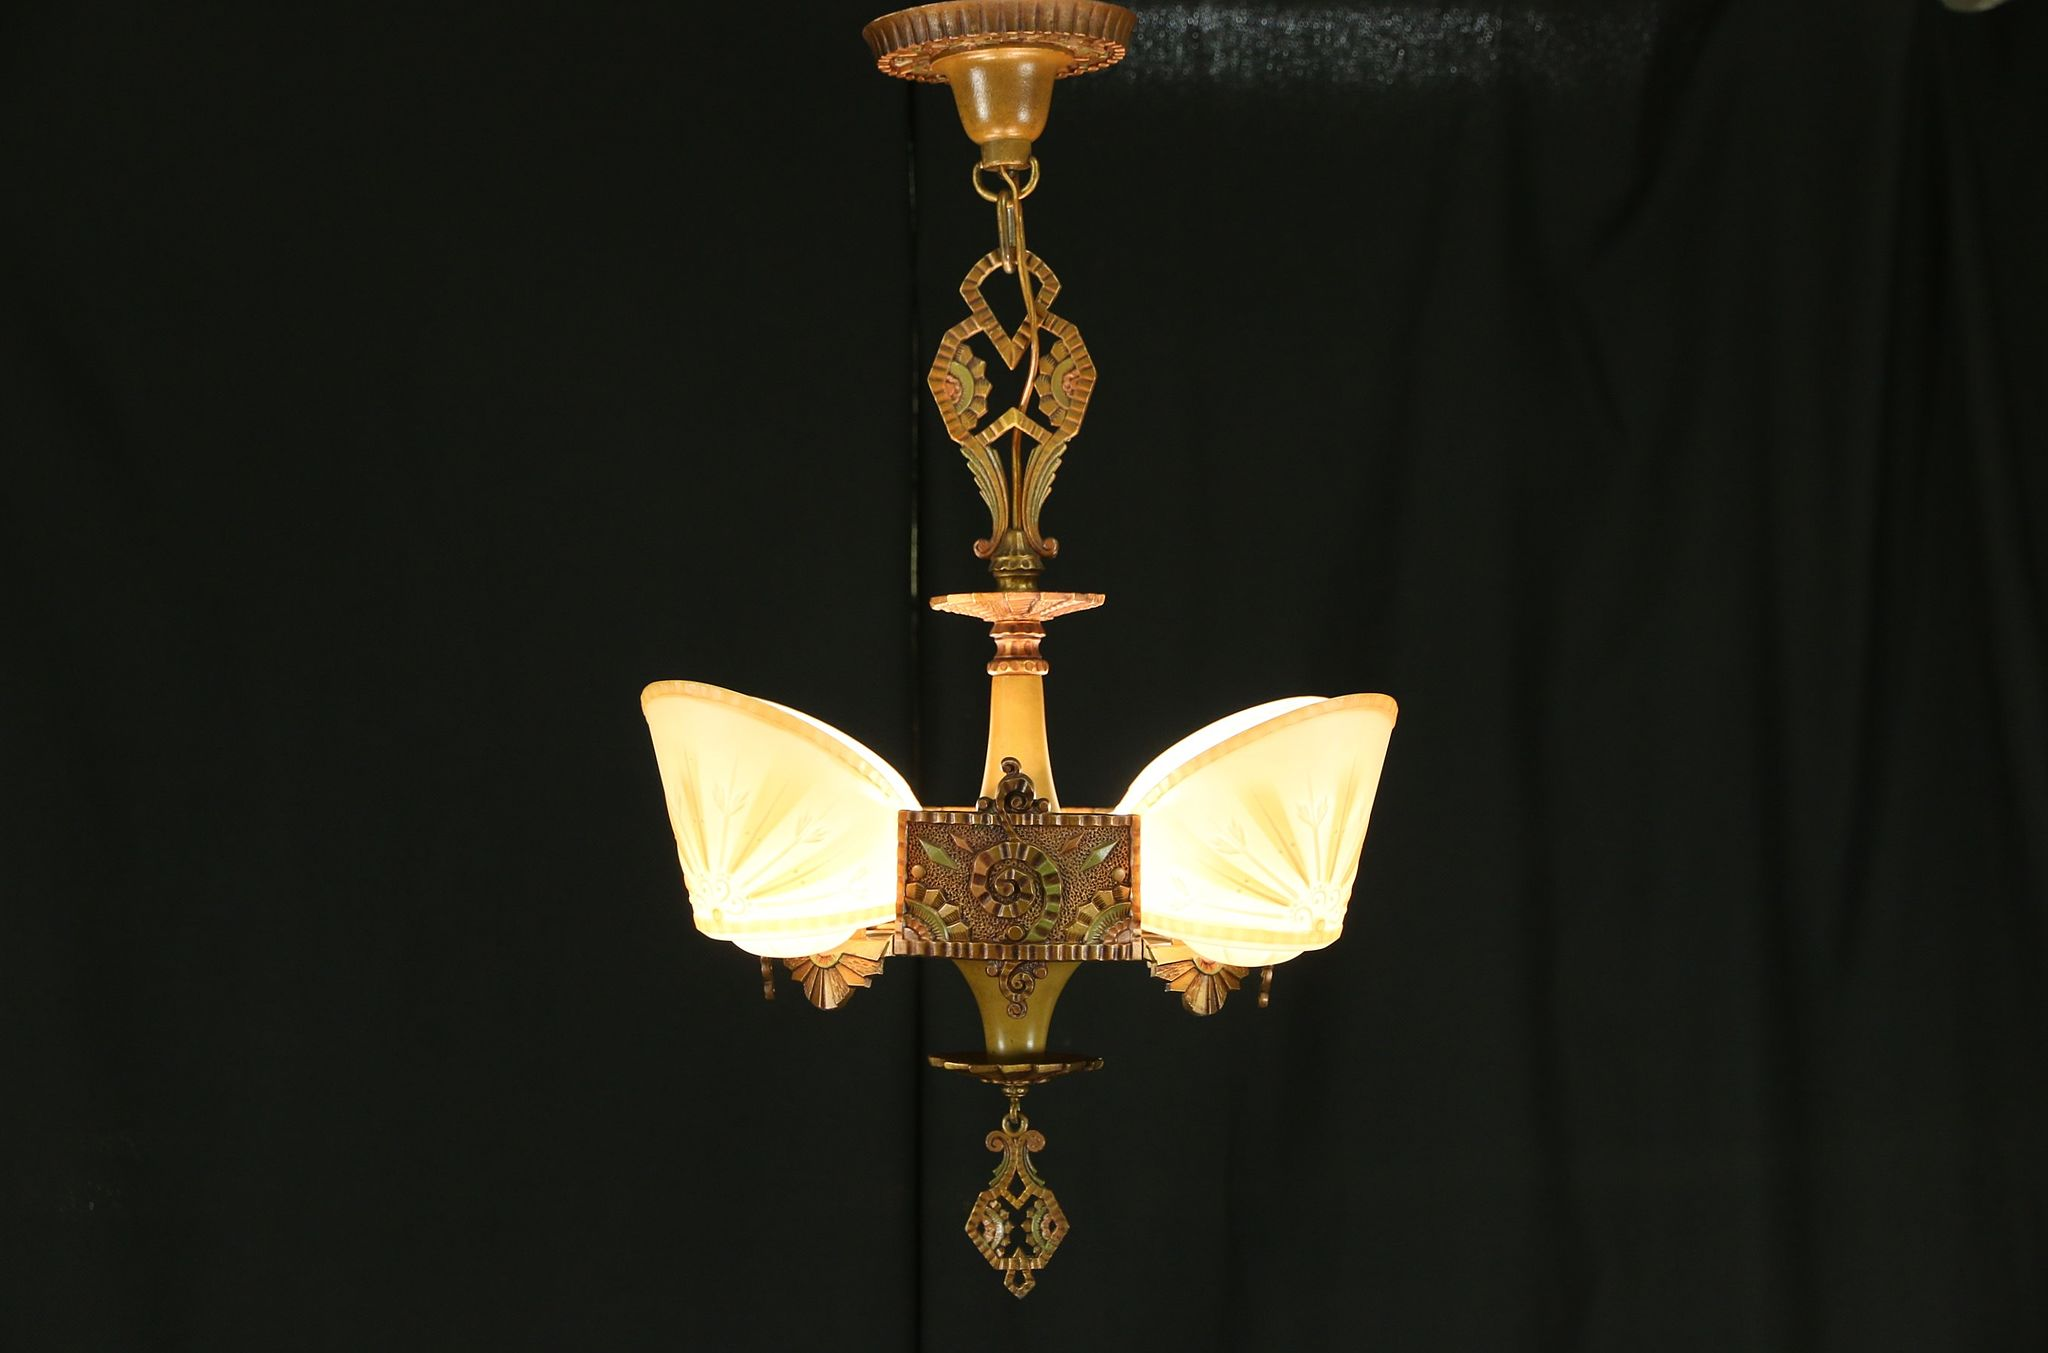 pair bronze american art a classic items ceiling deco lighting light ceilings lights of modernism